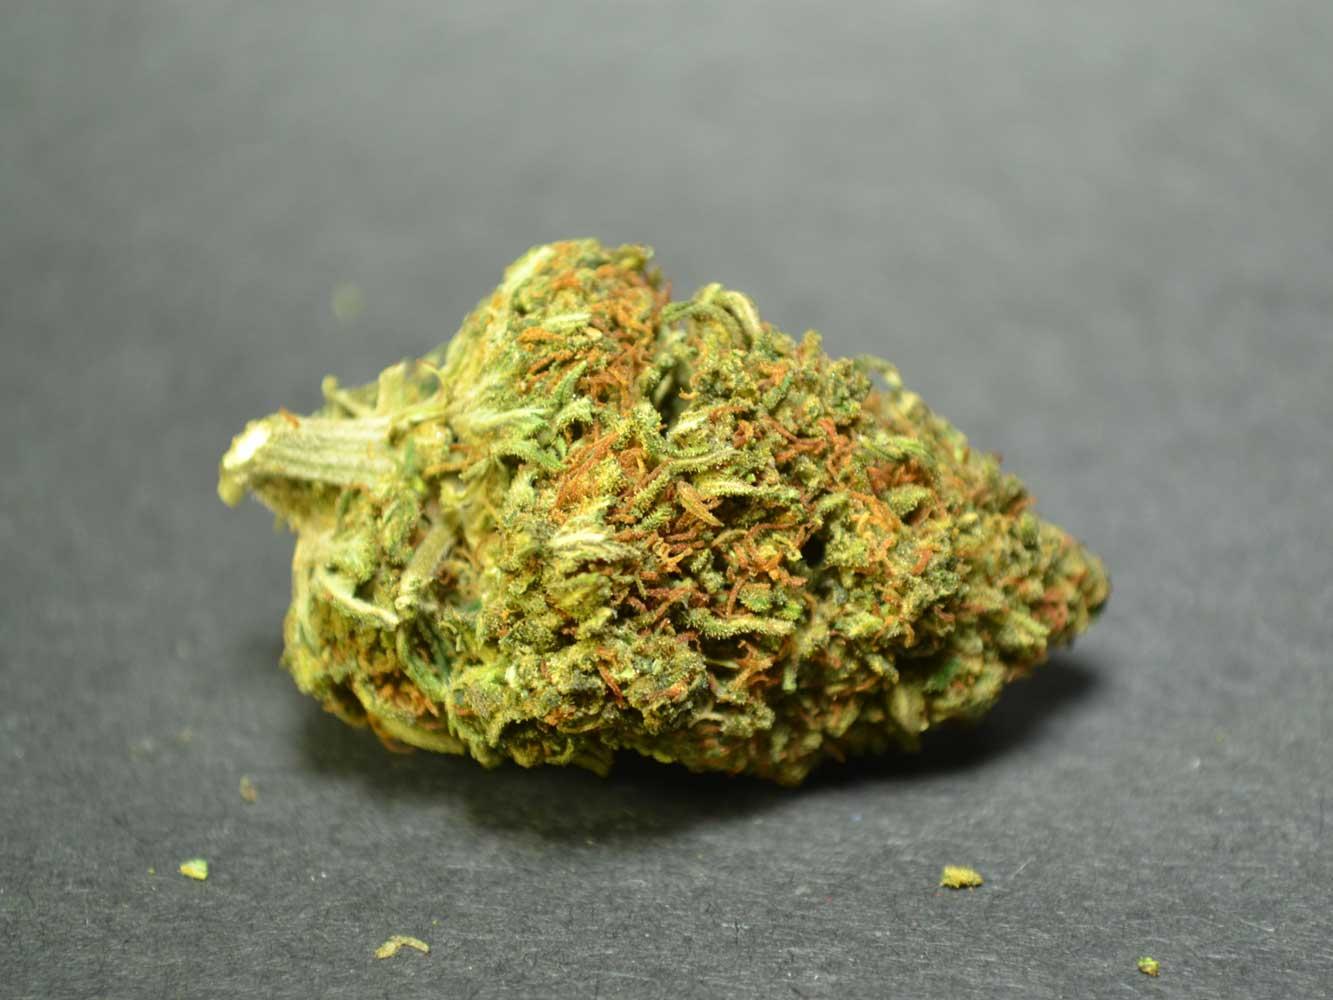 Space Candy CBD Flower from Empire Wellness - mjgeeks